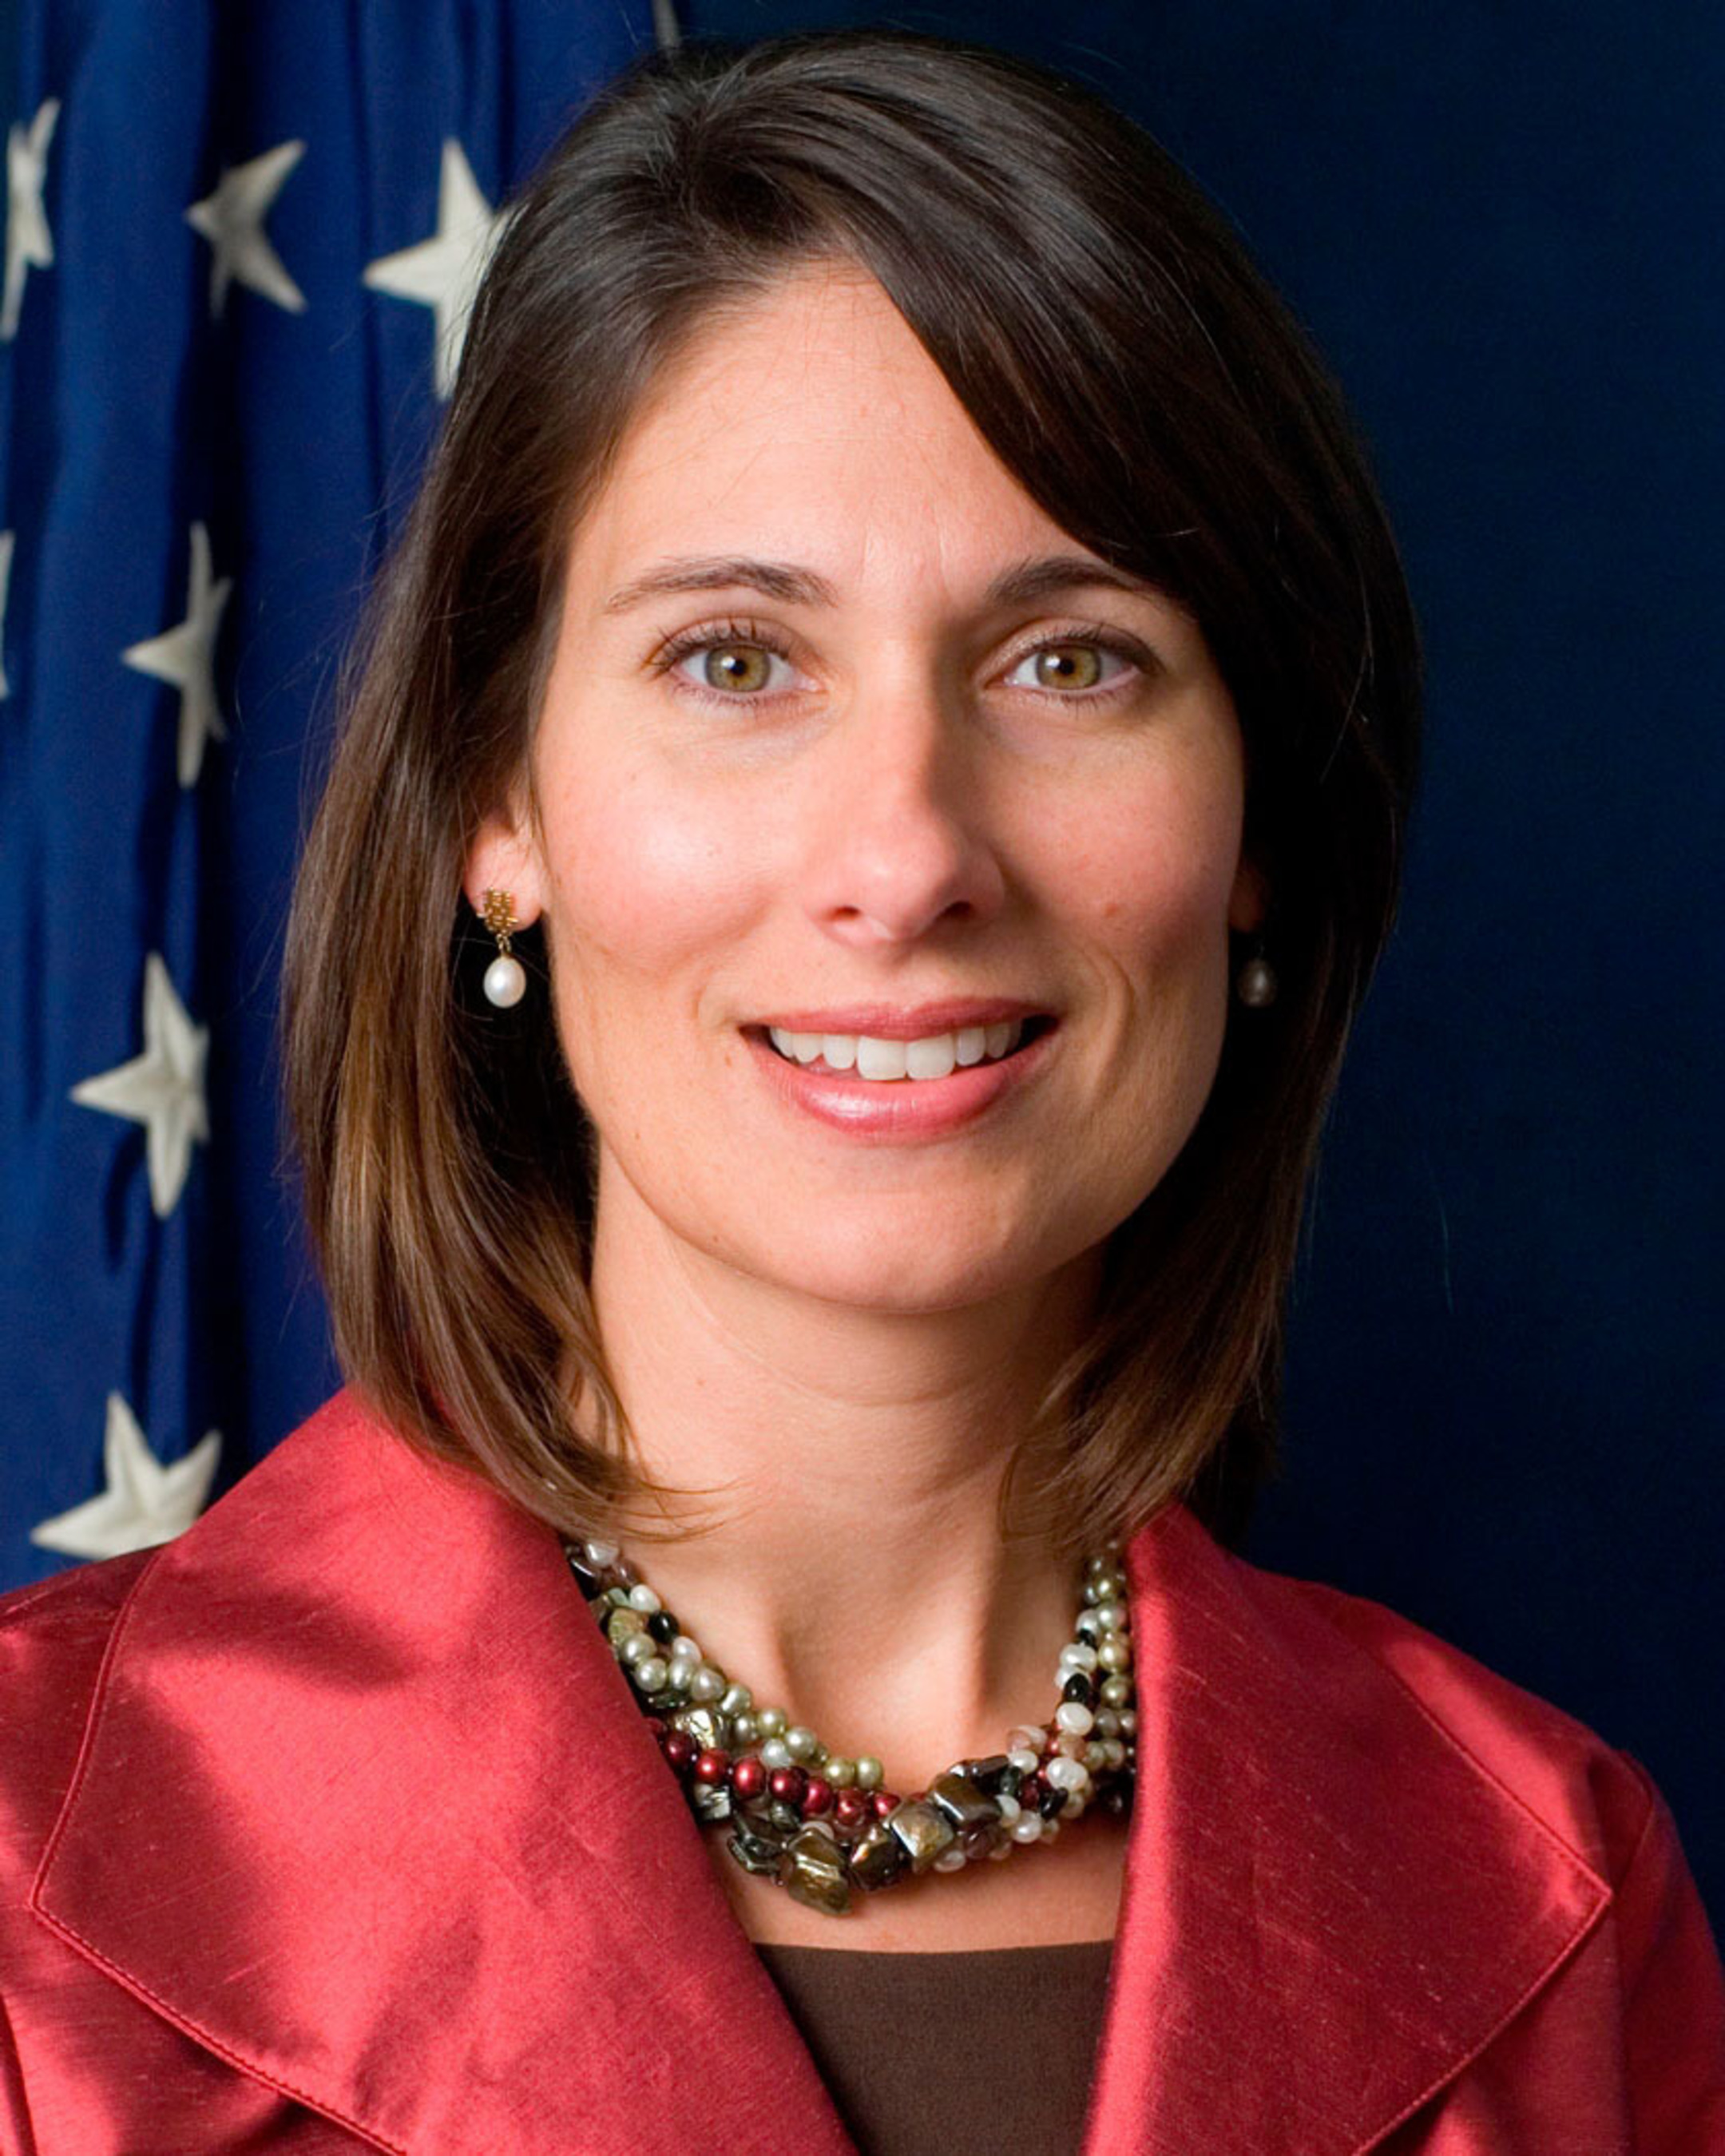 Deborah A. P. Hersman. (PRNewsFoto/National Safety Council) (PRNewsFoto/NATIONAL SAFETY COUNCIL)